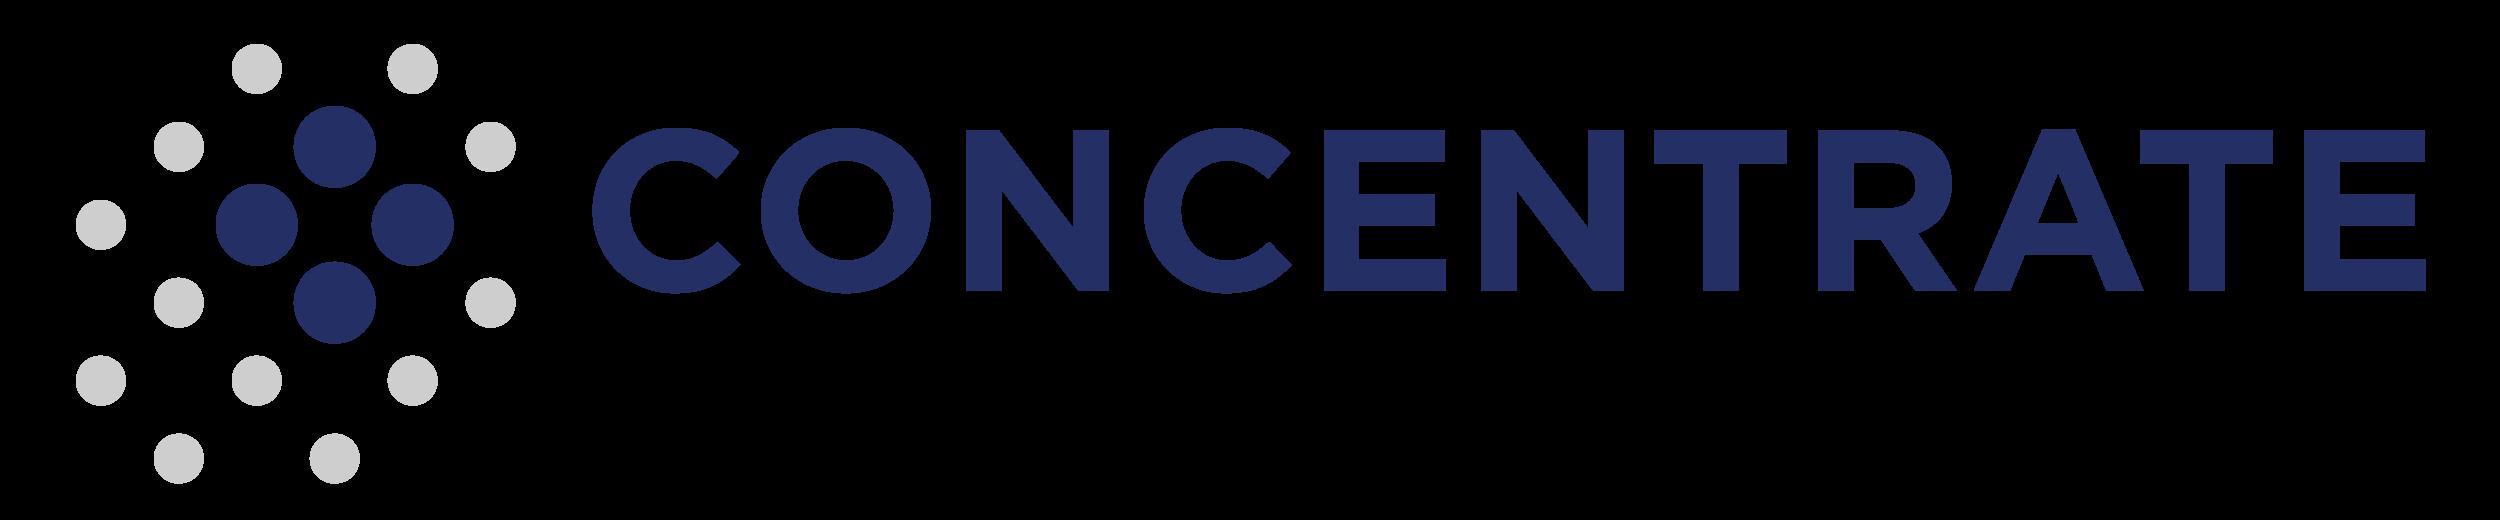 Concentrate-logo-2013-transparent.png